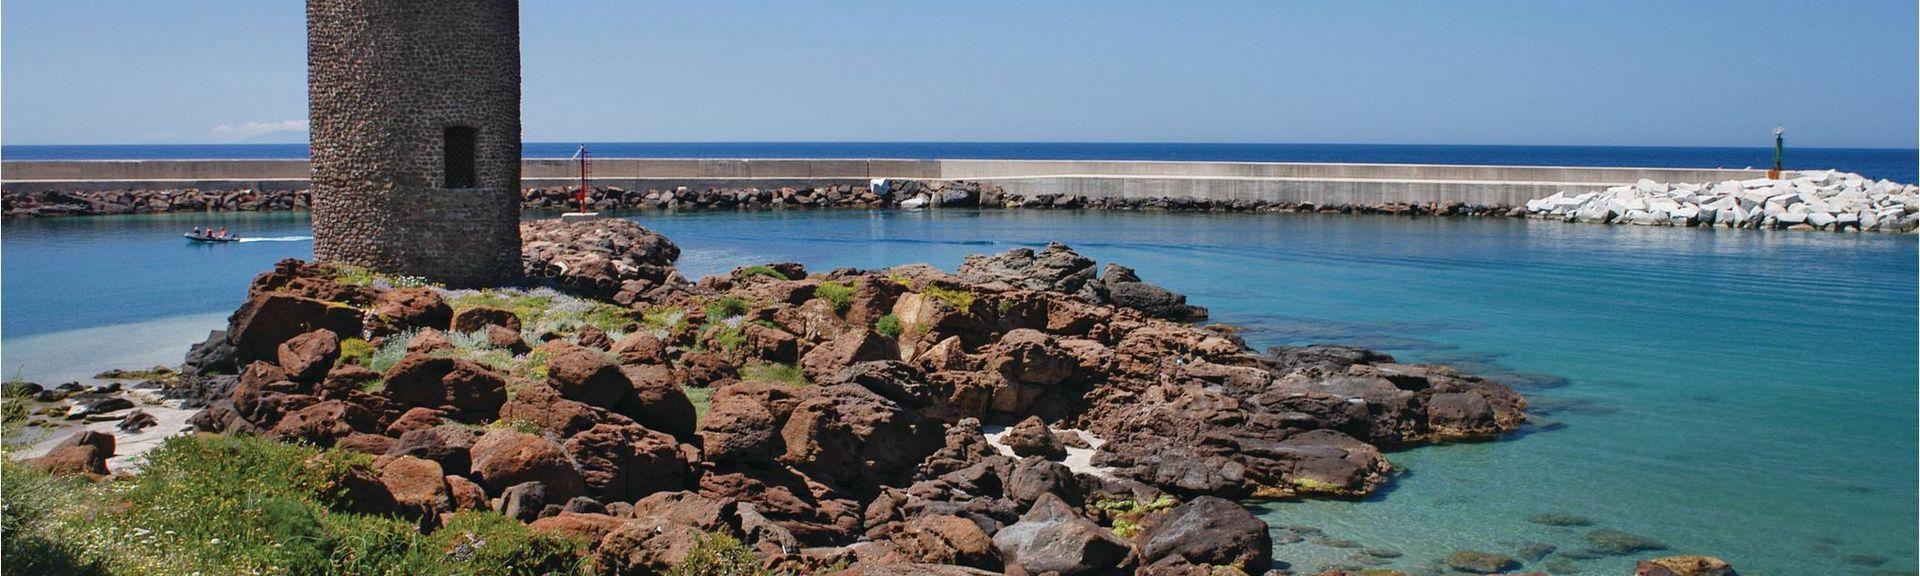 Eden Beach, Sorso, Sardegna, Italia